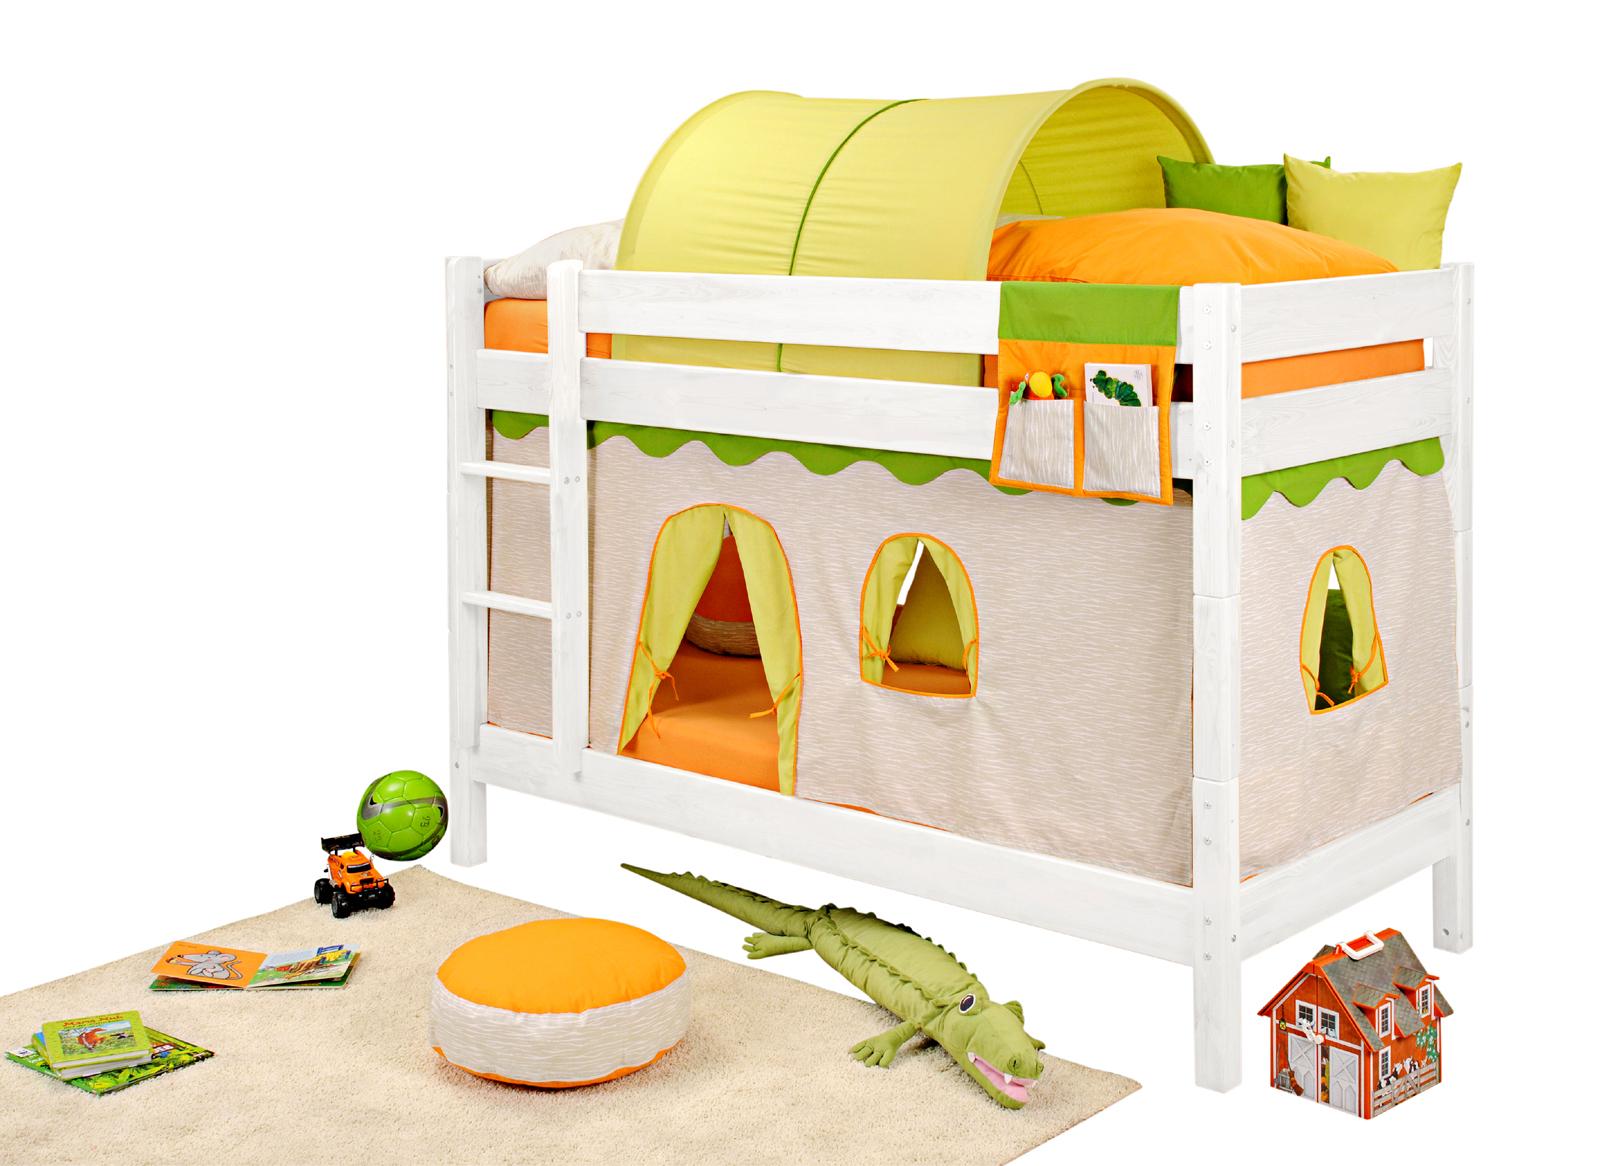 SAM® Kinder Etagenbett Dschungel I weiß gerade Massivholz